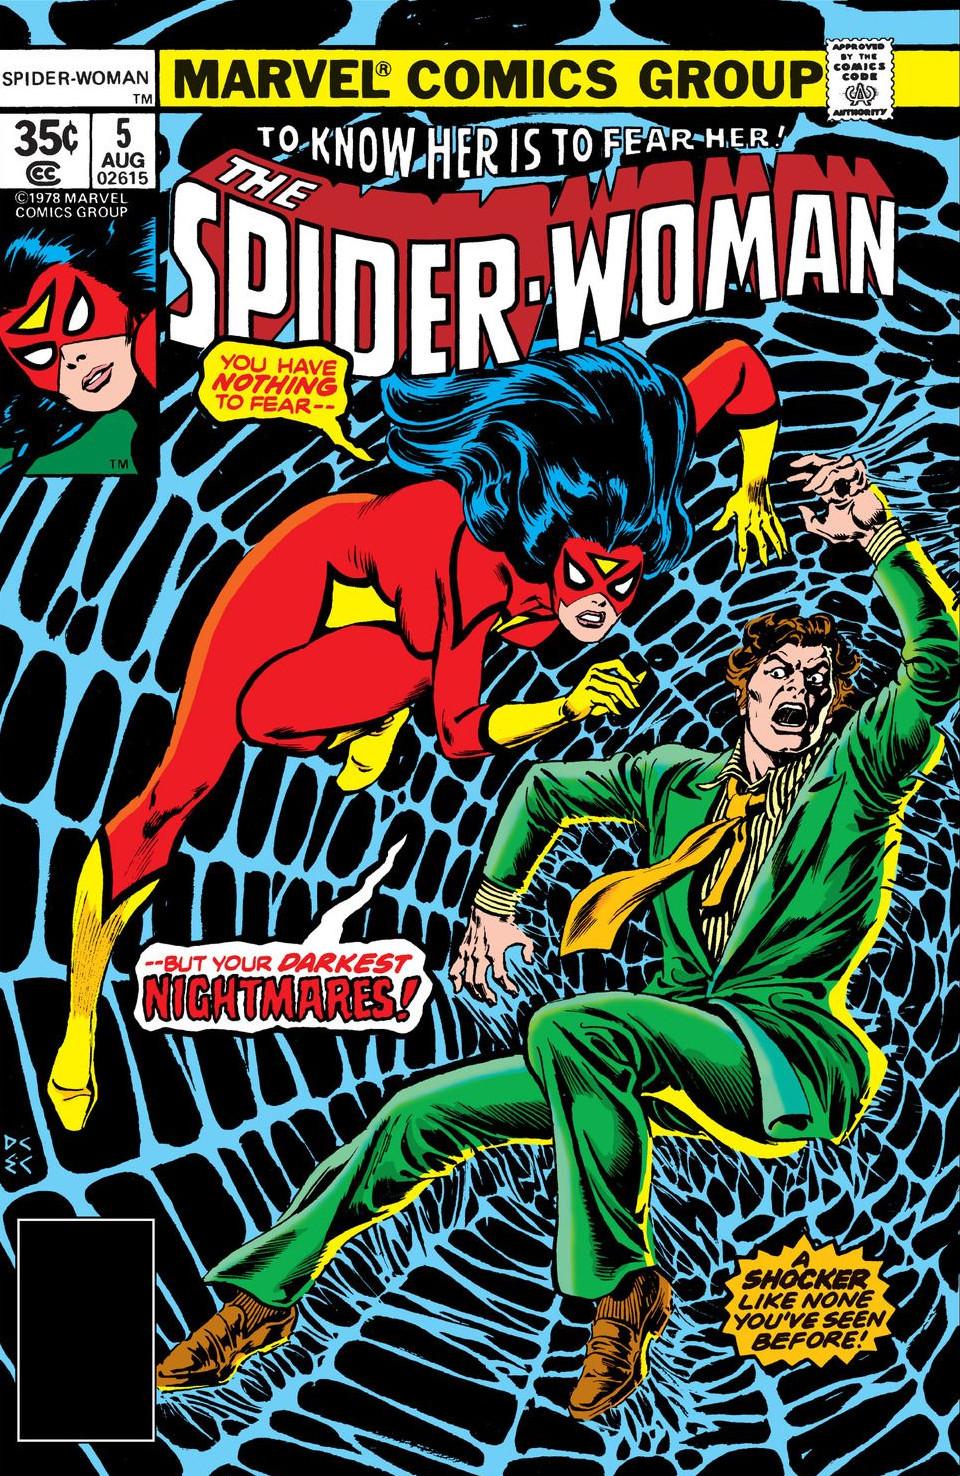 Spider-Woman Vol 1 5